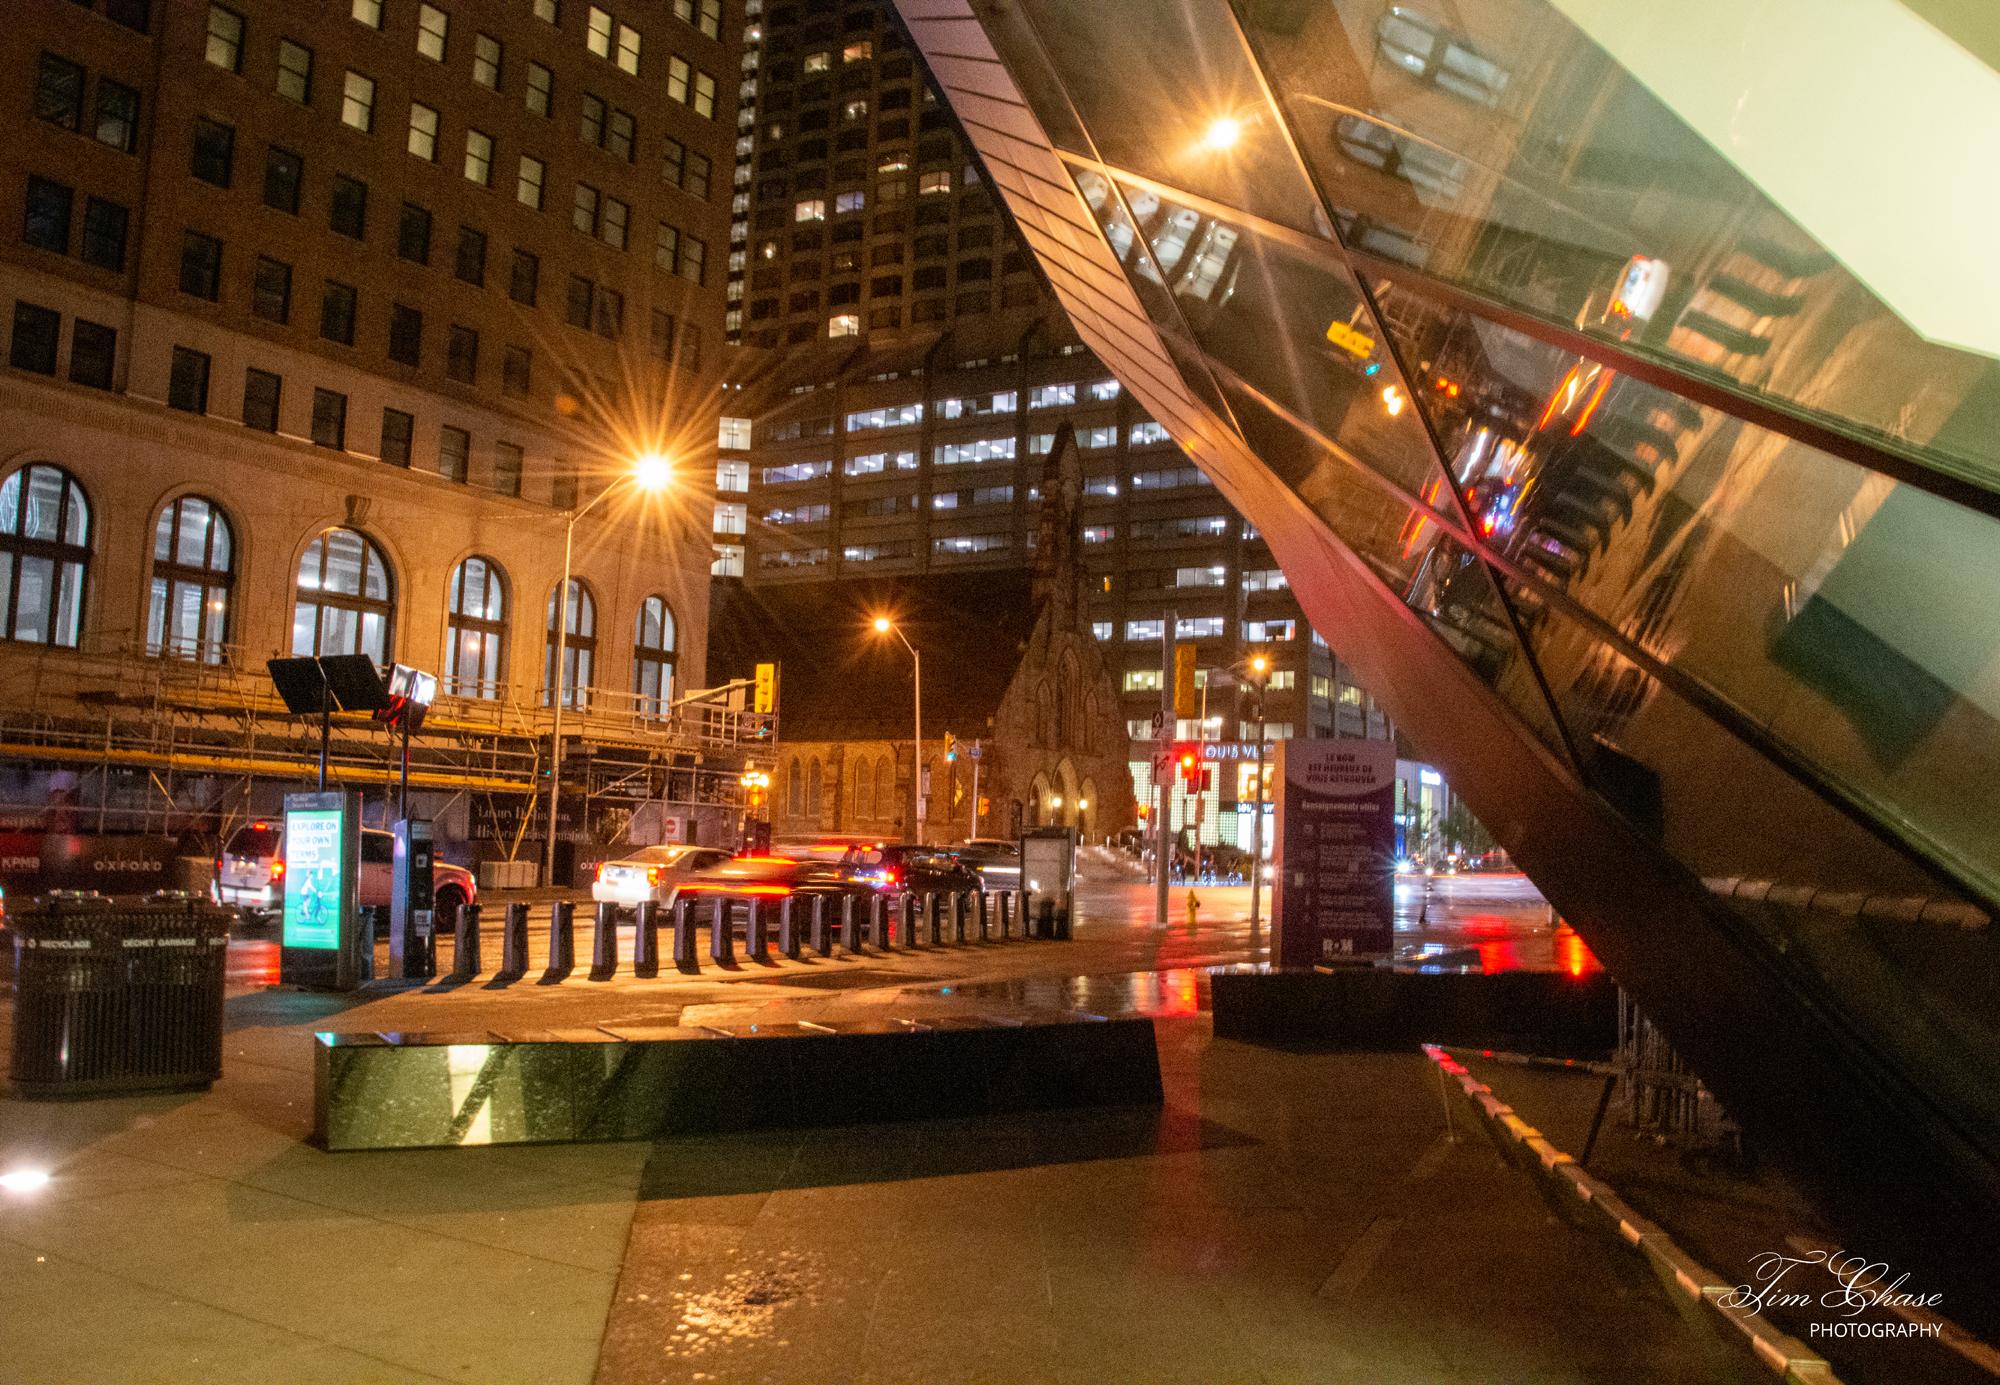 DSC_2292_copy Toronto Photography | Tim Chase Photography